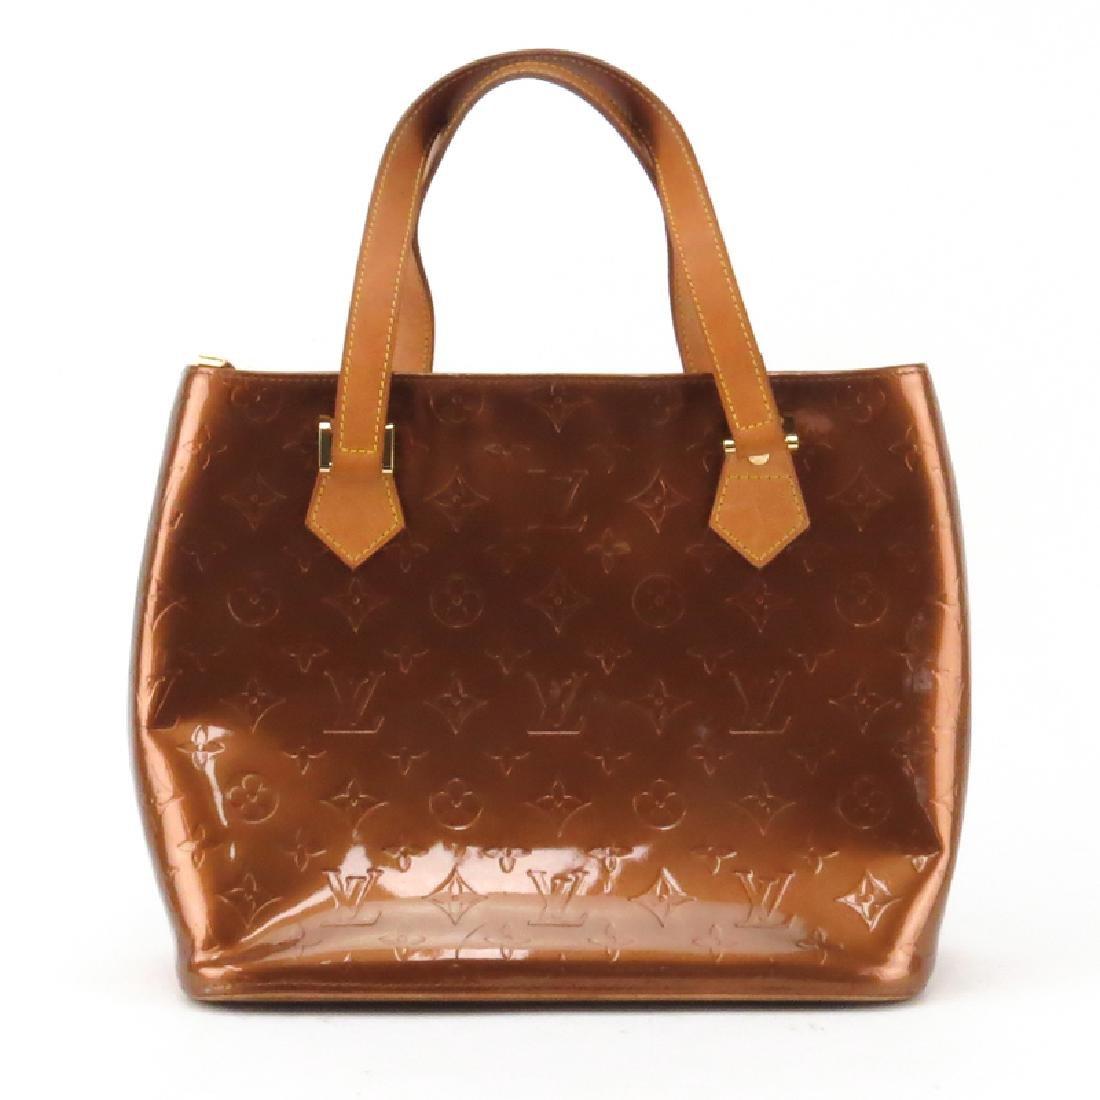 Louis Vuitton Vernis Houston Bag. Copper monogram